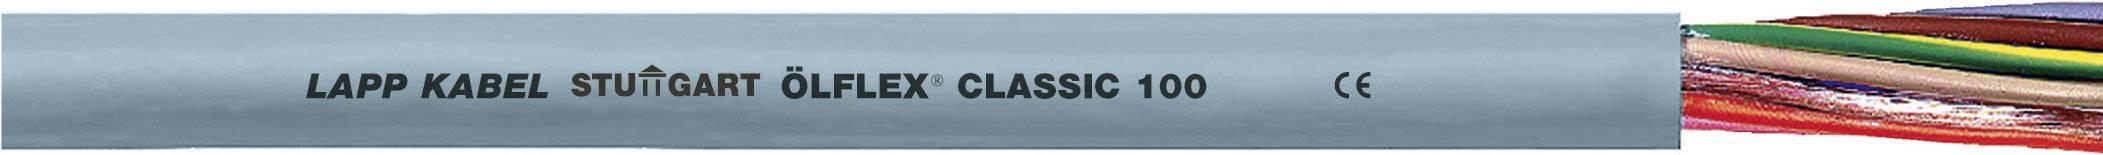 Kabel LappKabel Ölflex CLASSIC 100 4G50 (00101193), PVC, 34,5 mm, 750 V, šedá, 500 m